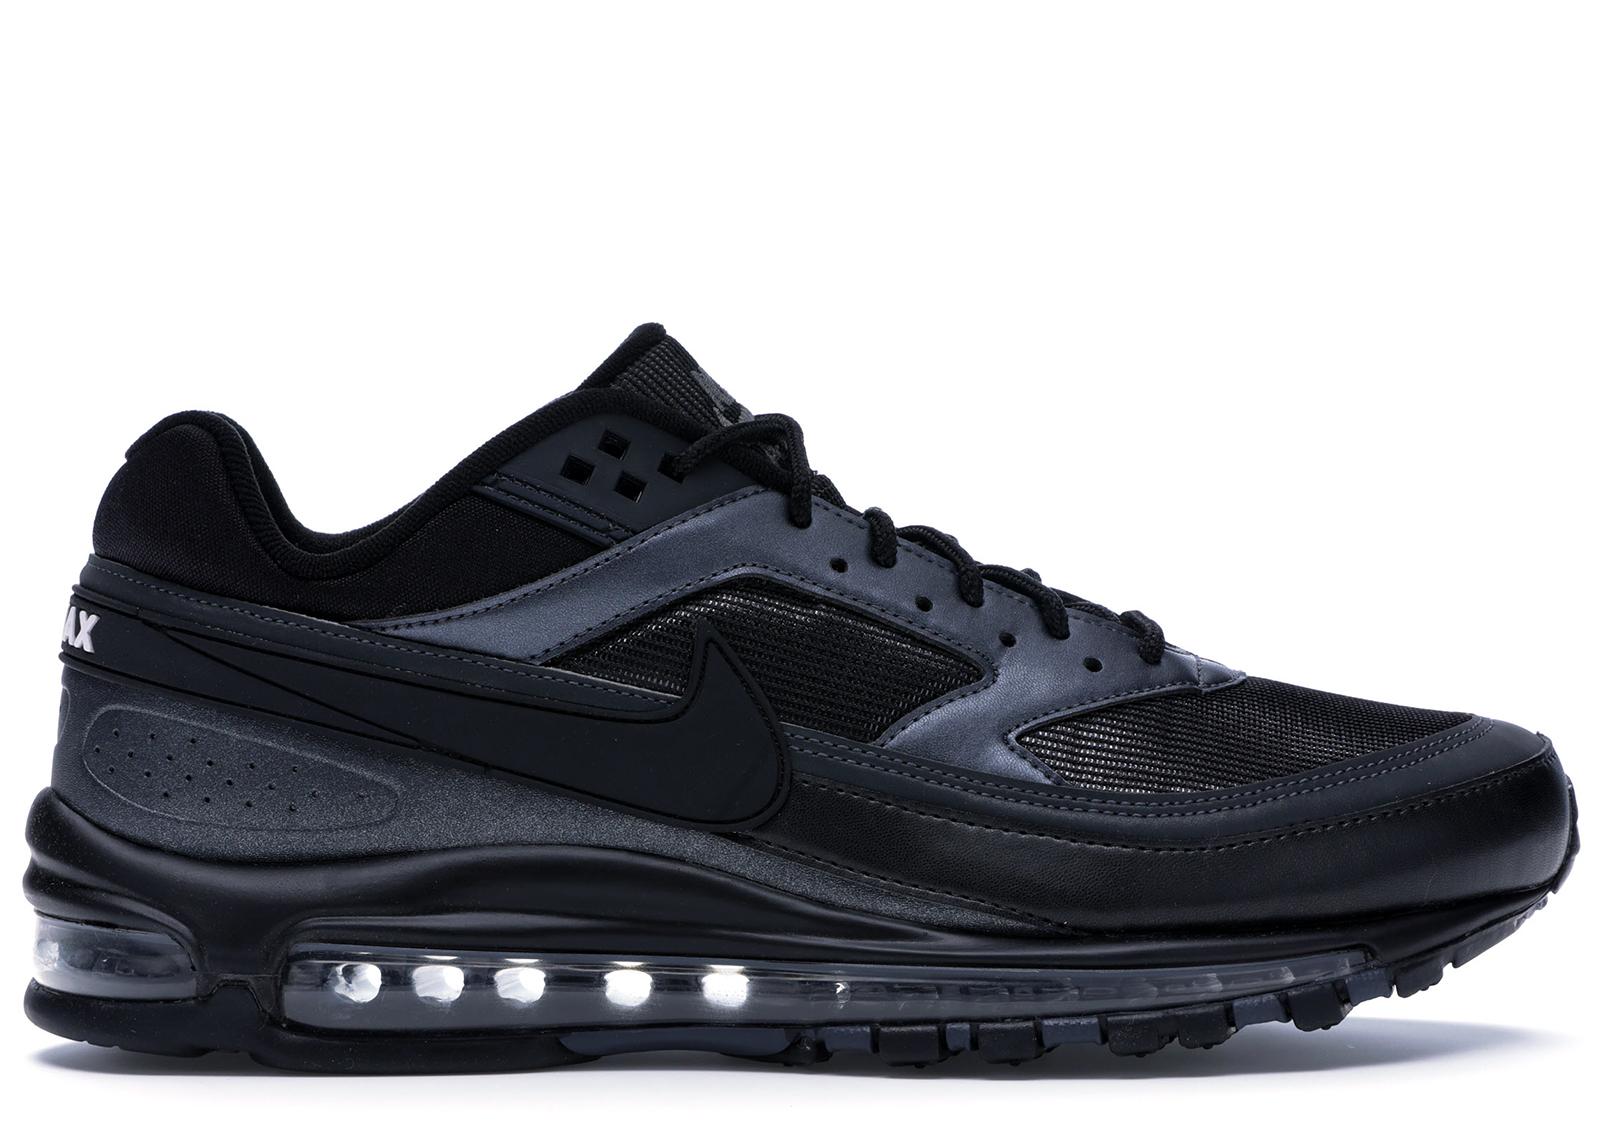 Nike Air Max 97/BW Black Metallic